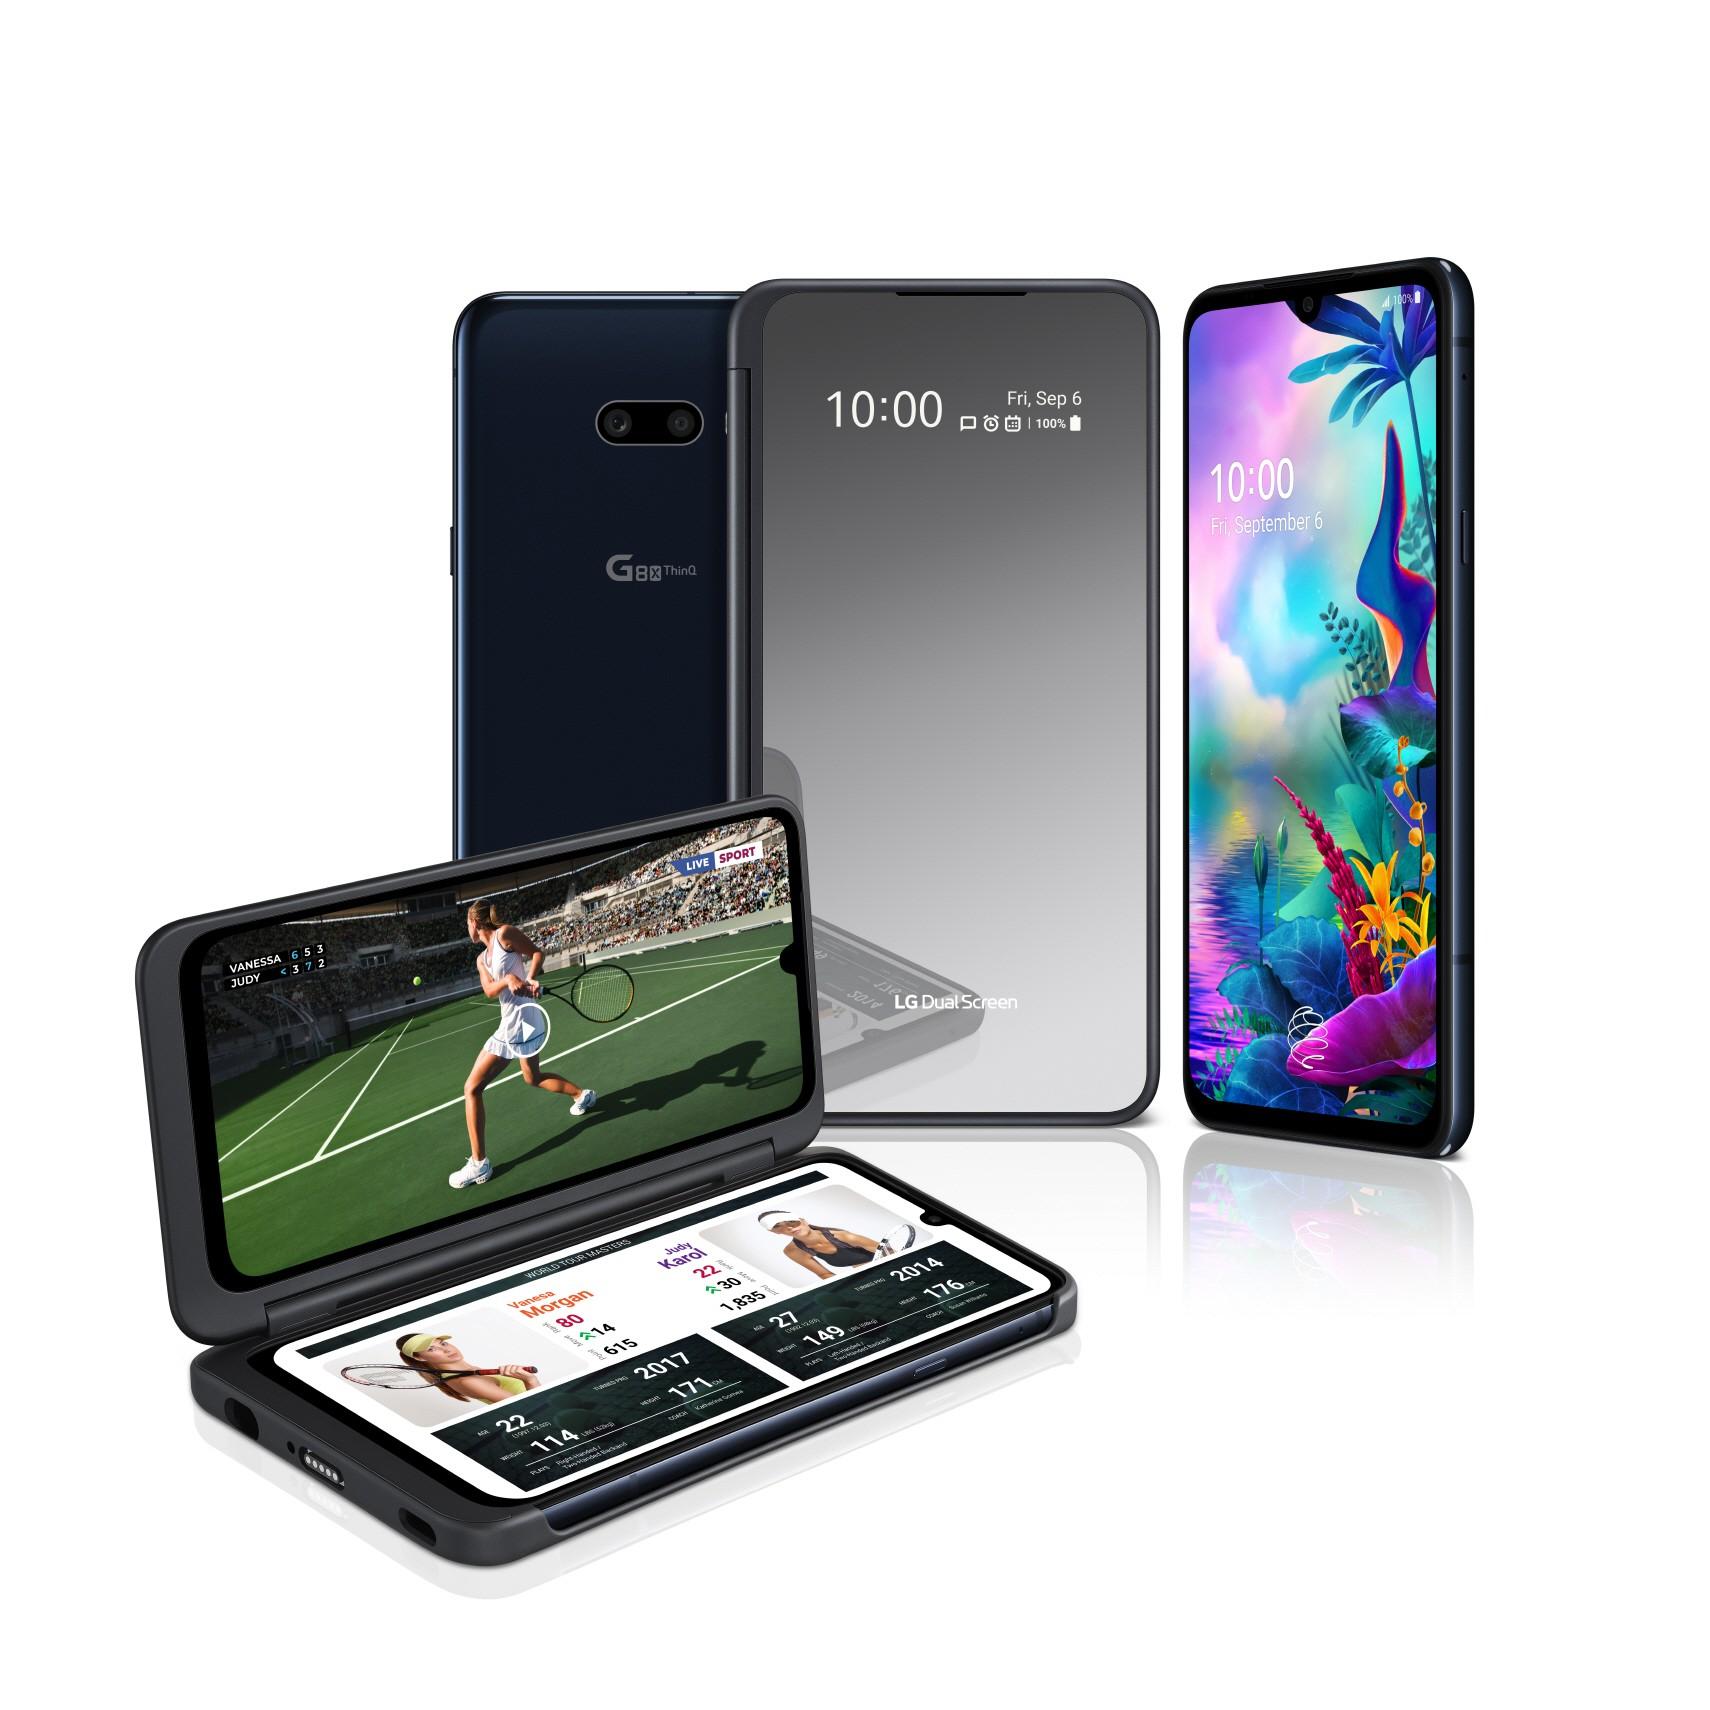 LG G8X THINQ AND NEW LG DUAL SCREEN ENHANCE MOBILE